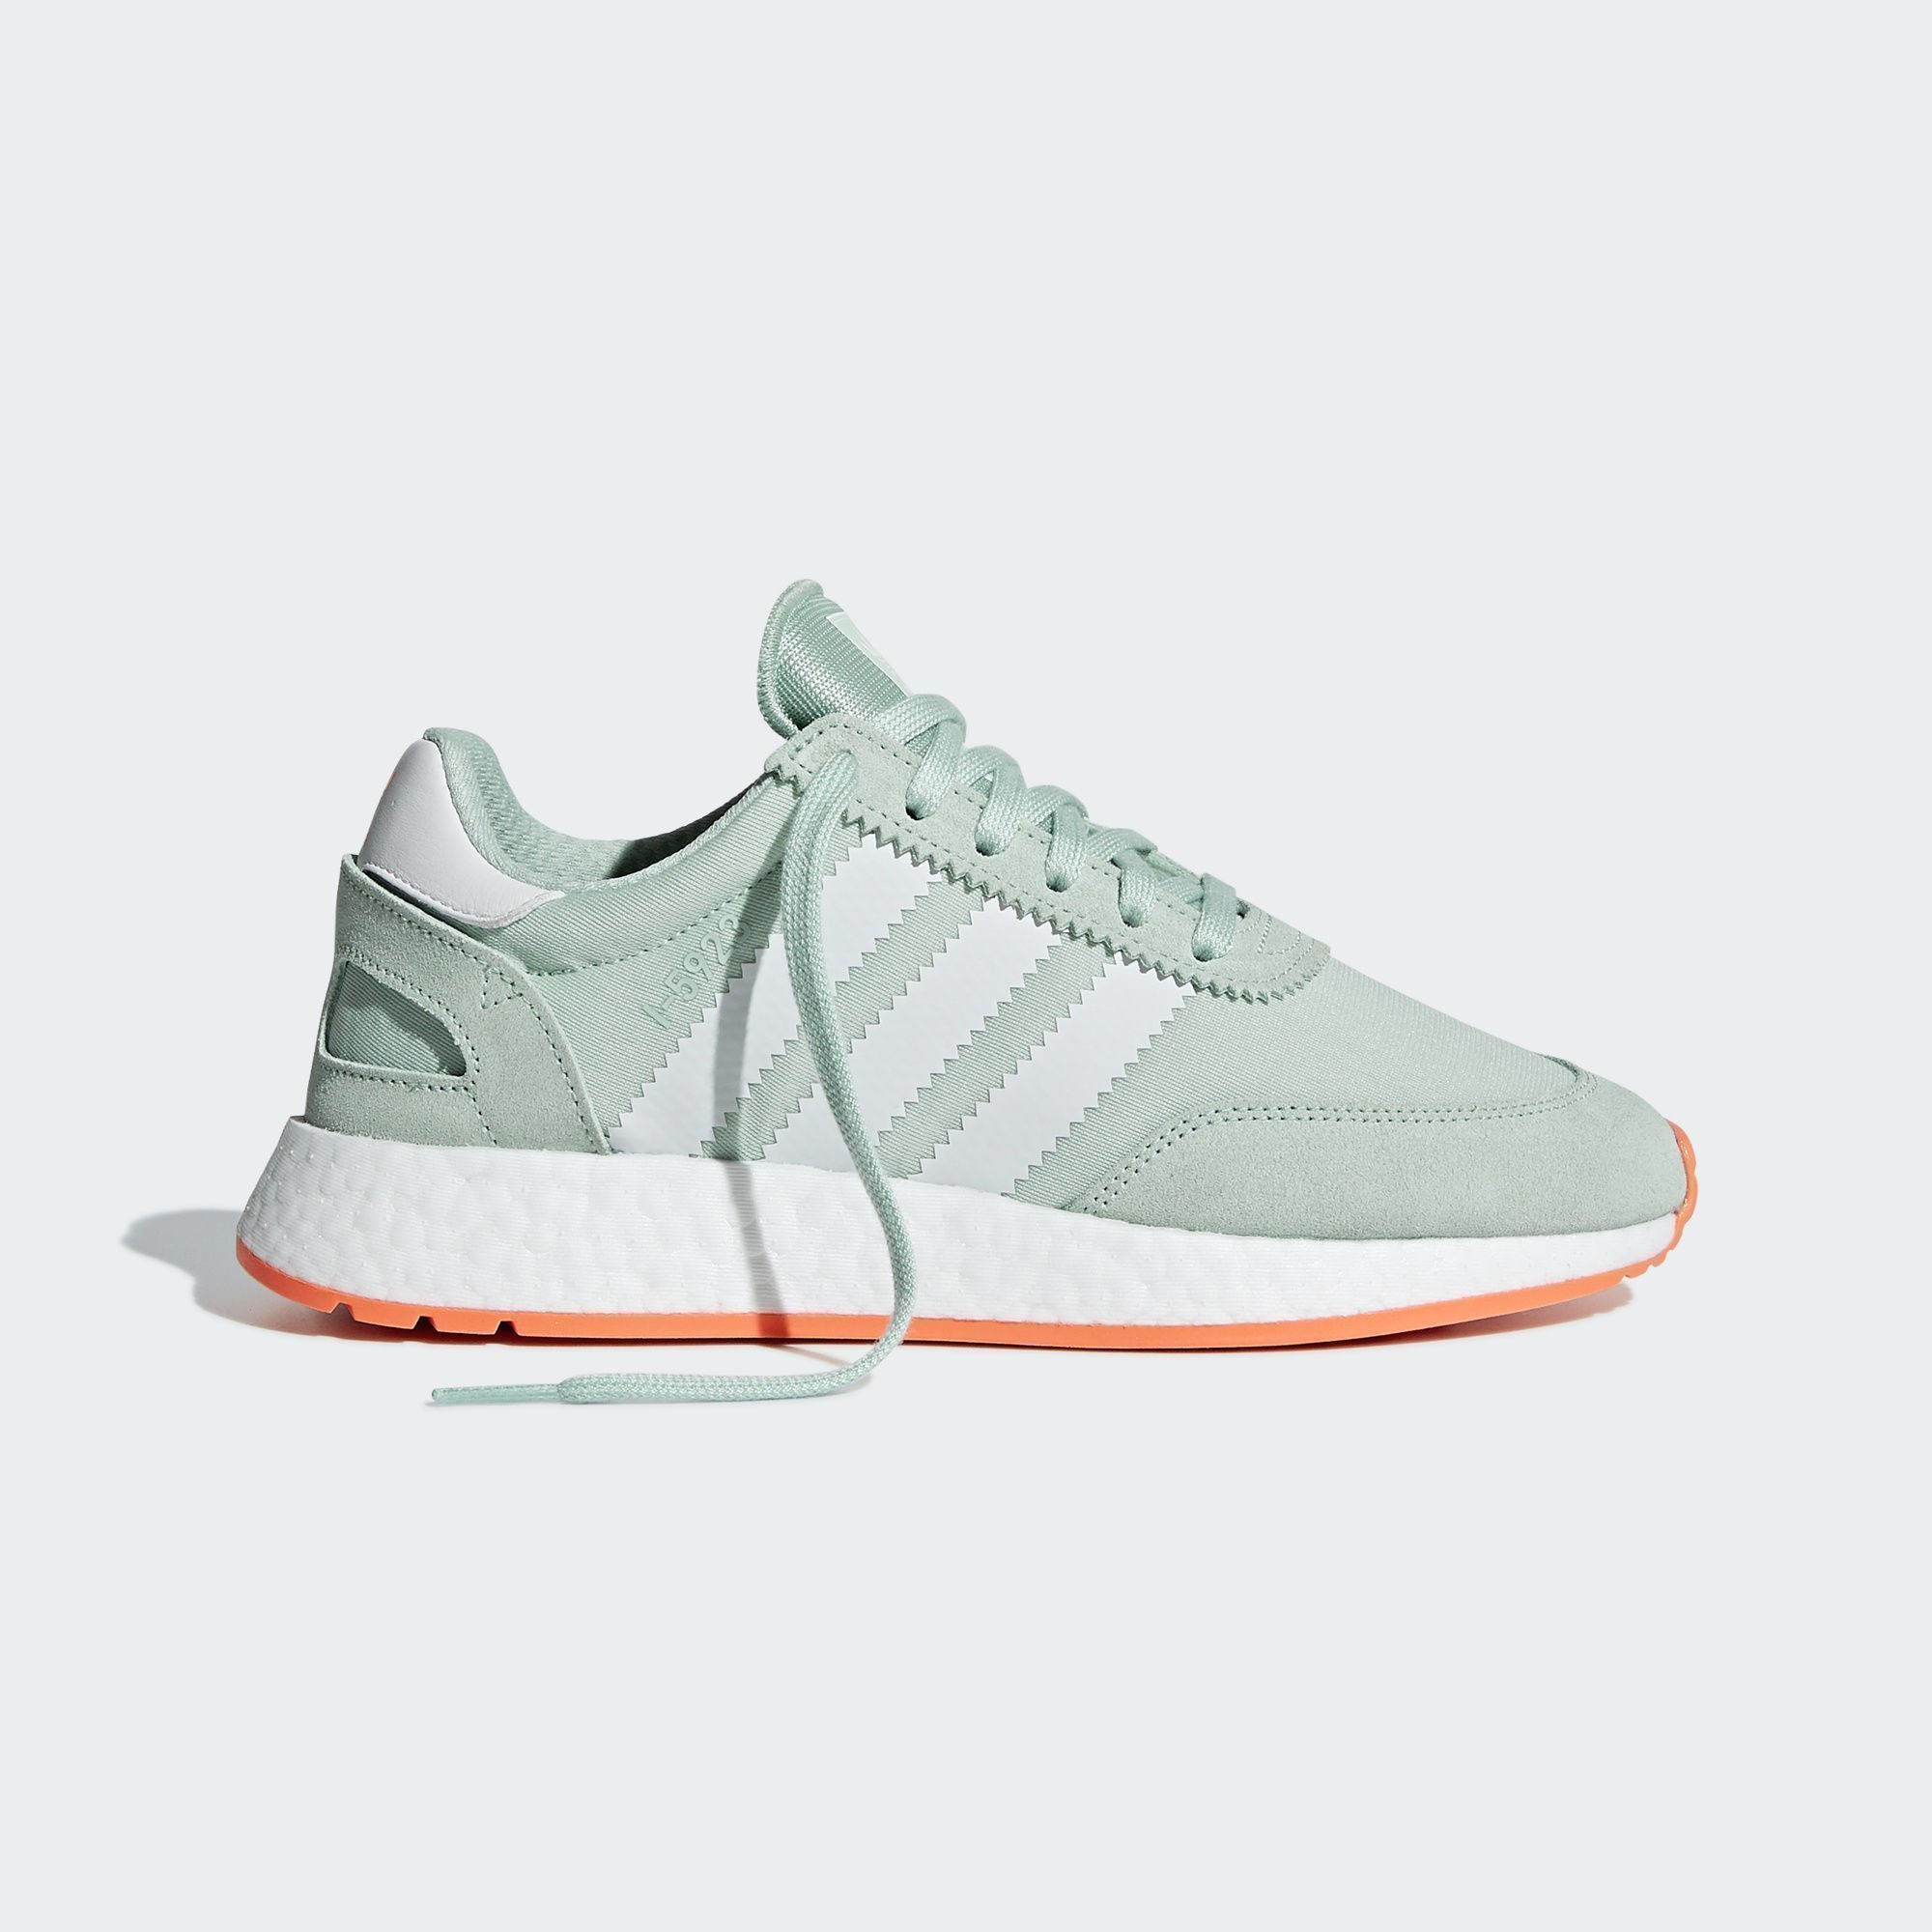 adidas I-5923 'Ash Green' (B37974)